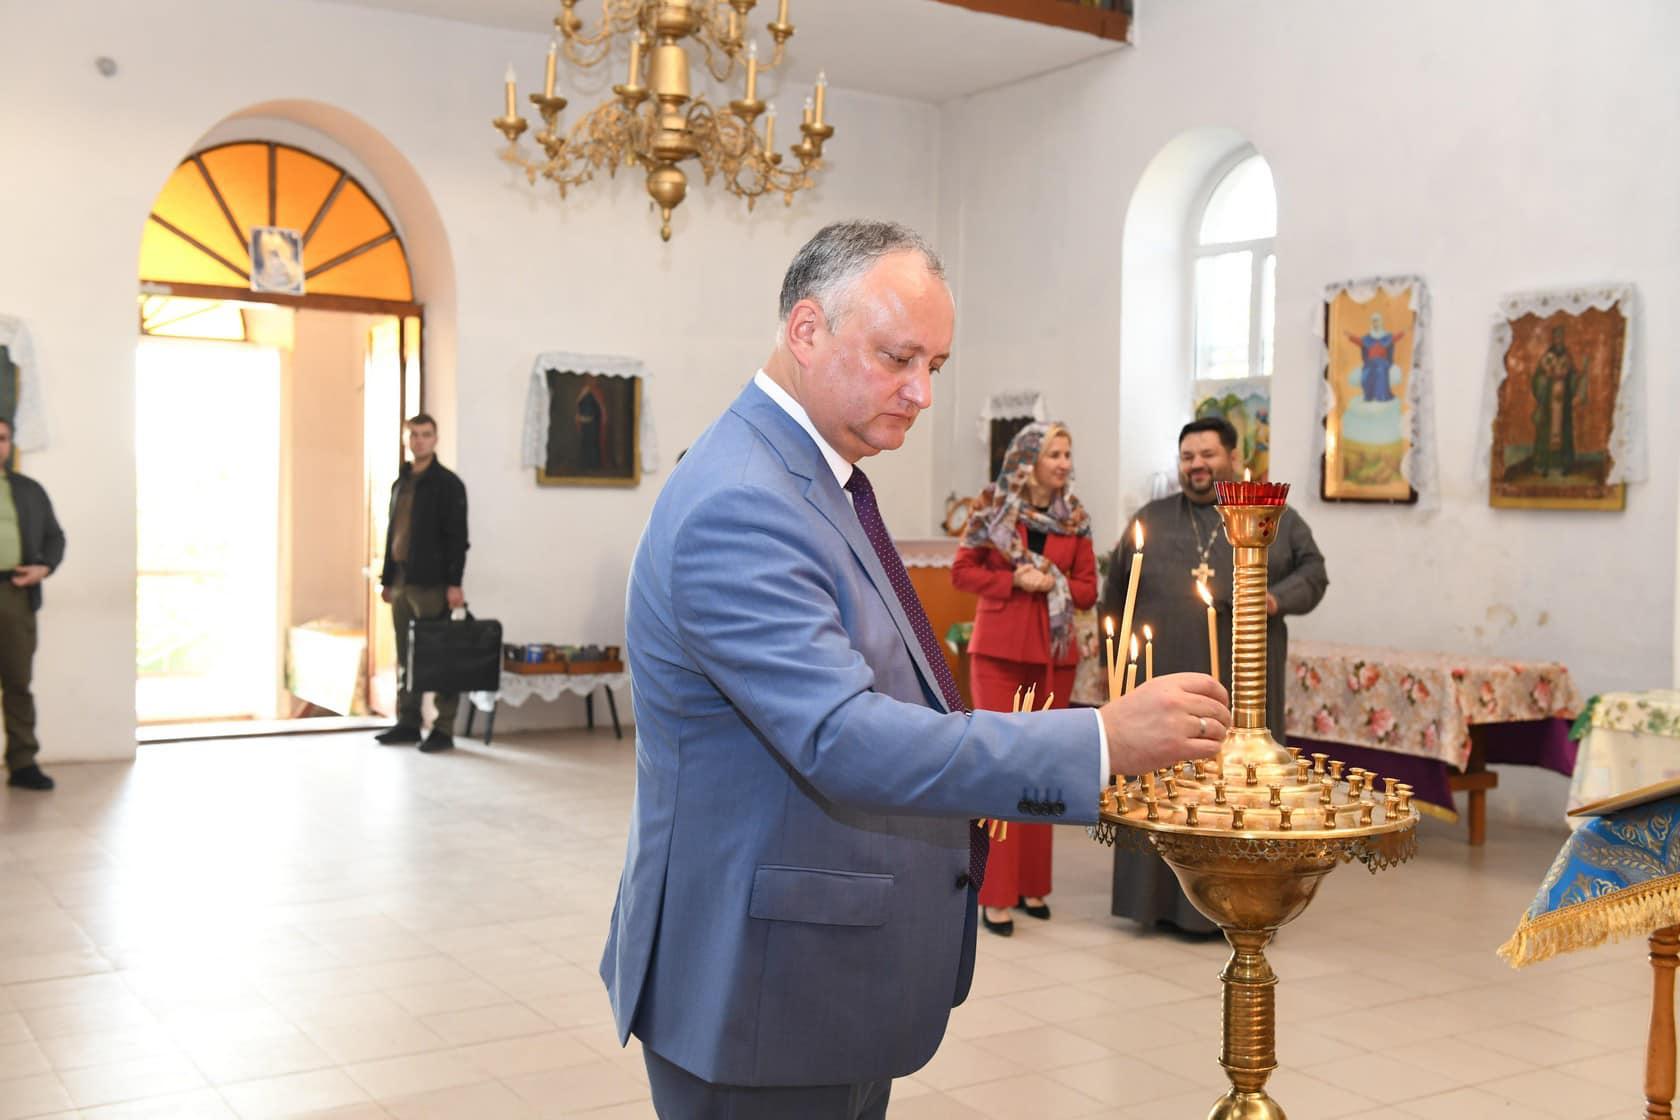 (ФОТО) Президент РМ и башкан Гагаузии посетили храм в Етулии